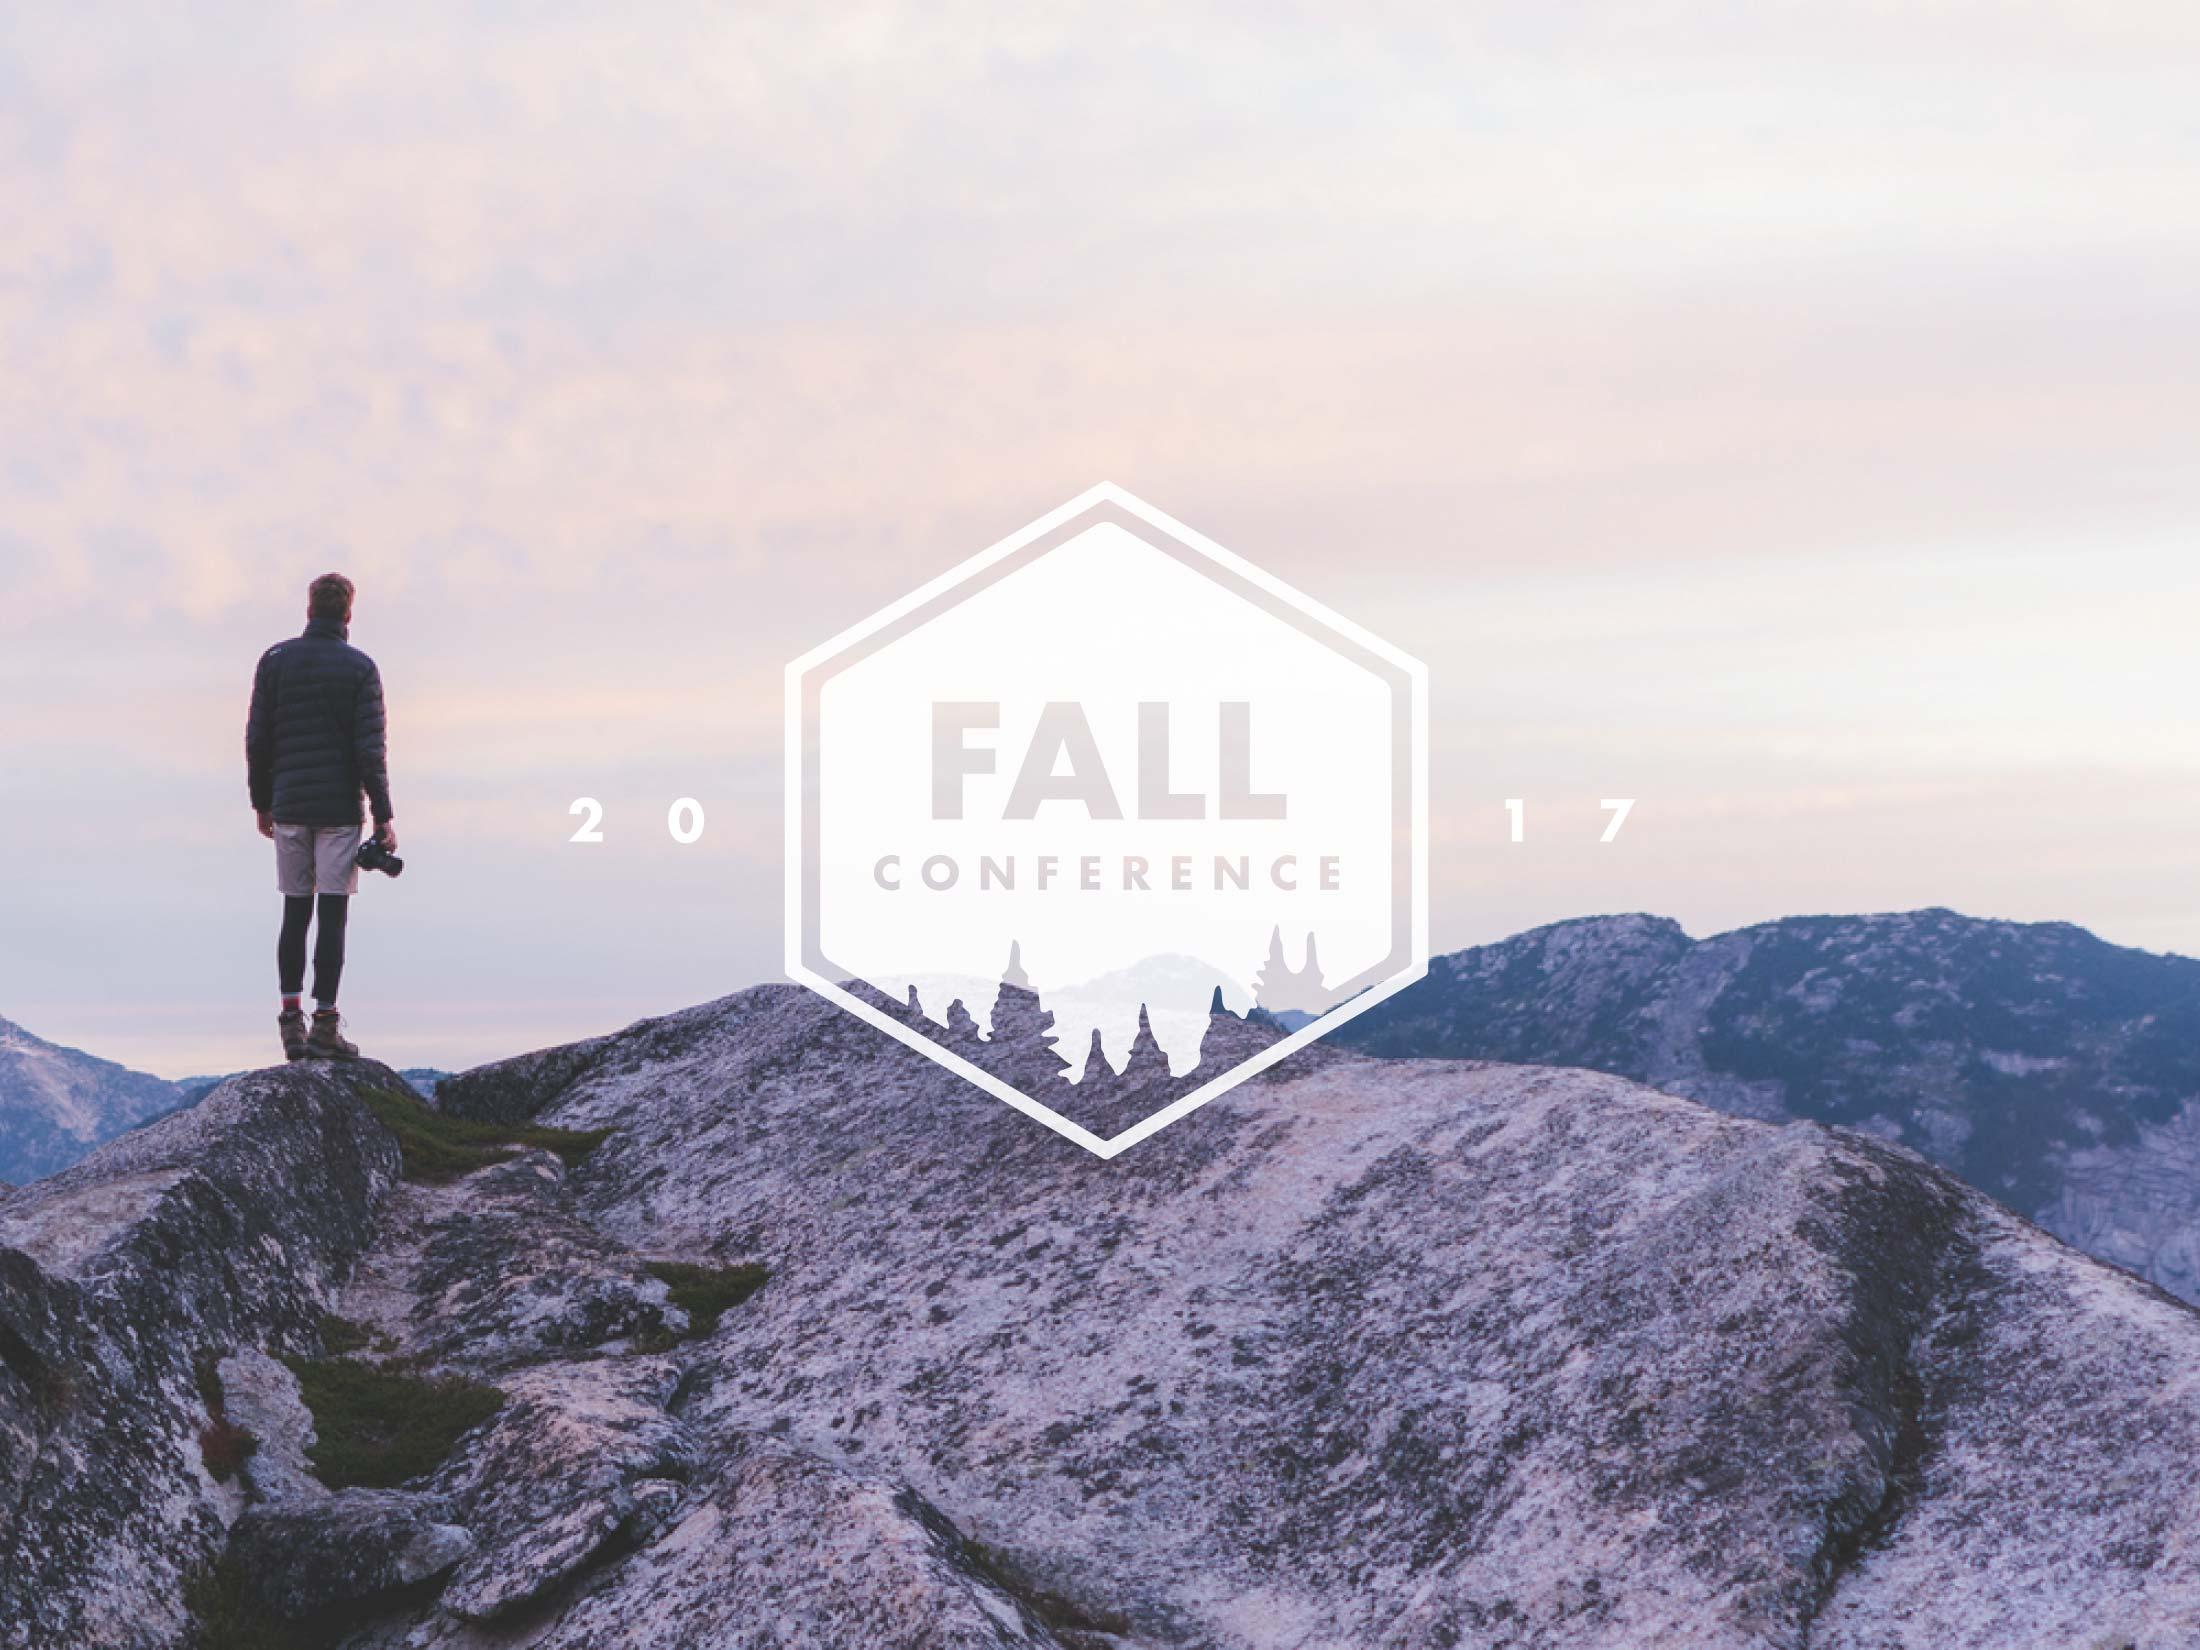 2017 08 fallconference2017 3banner